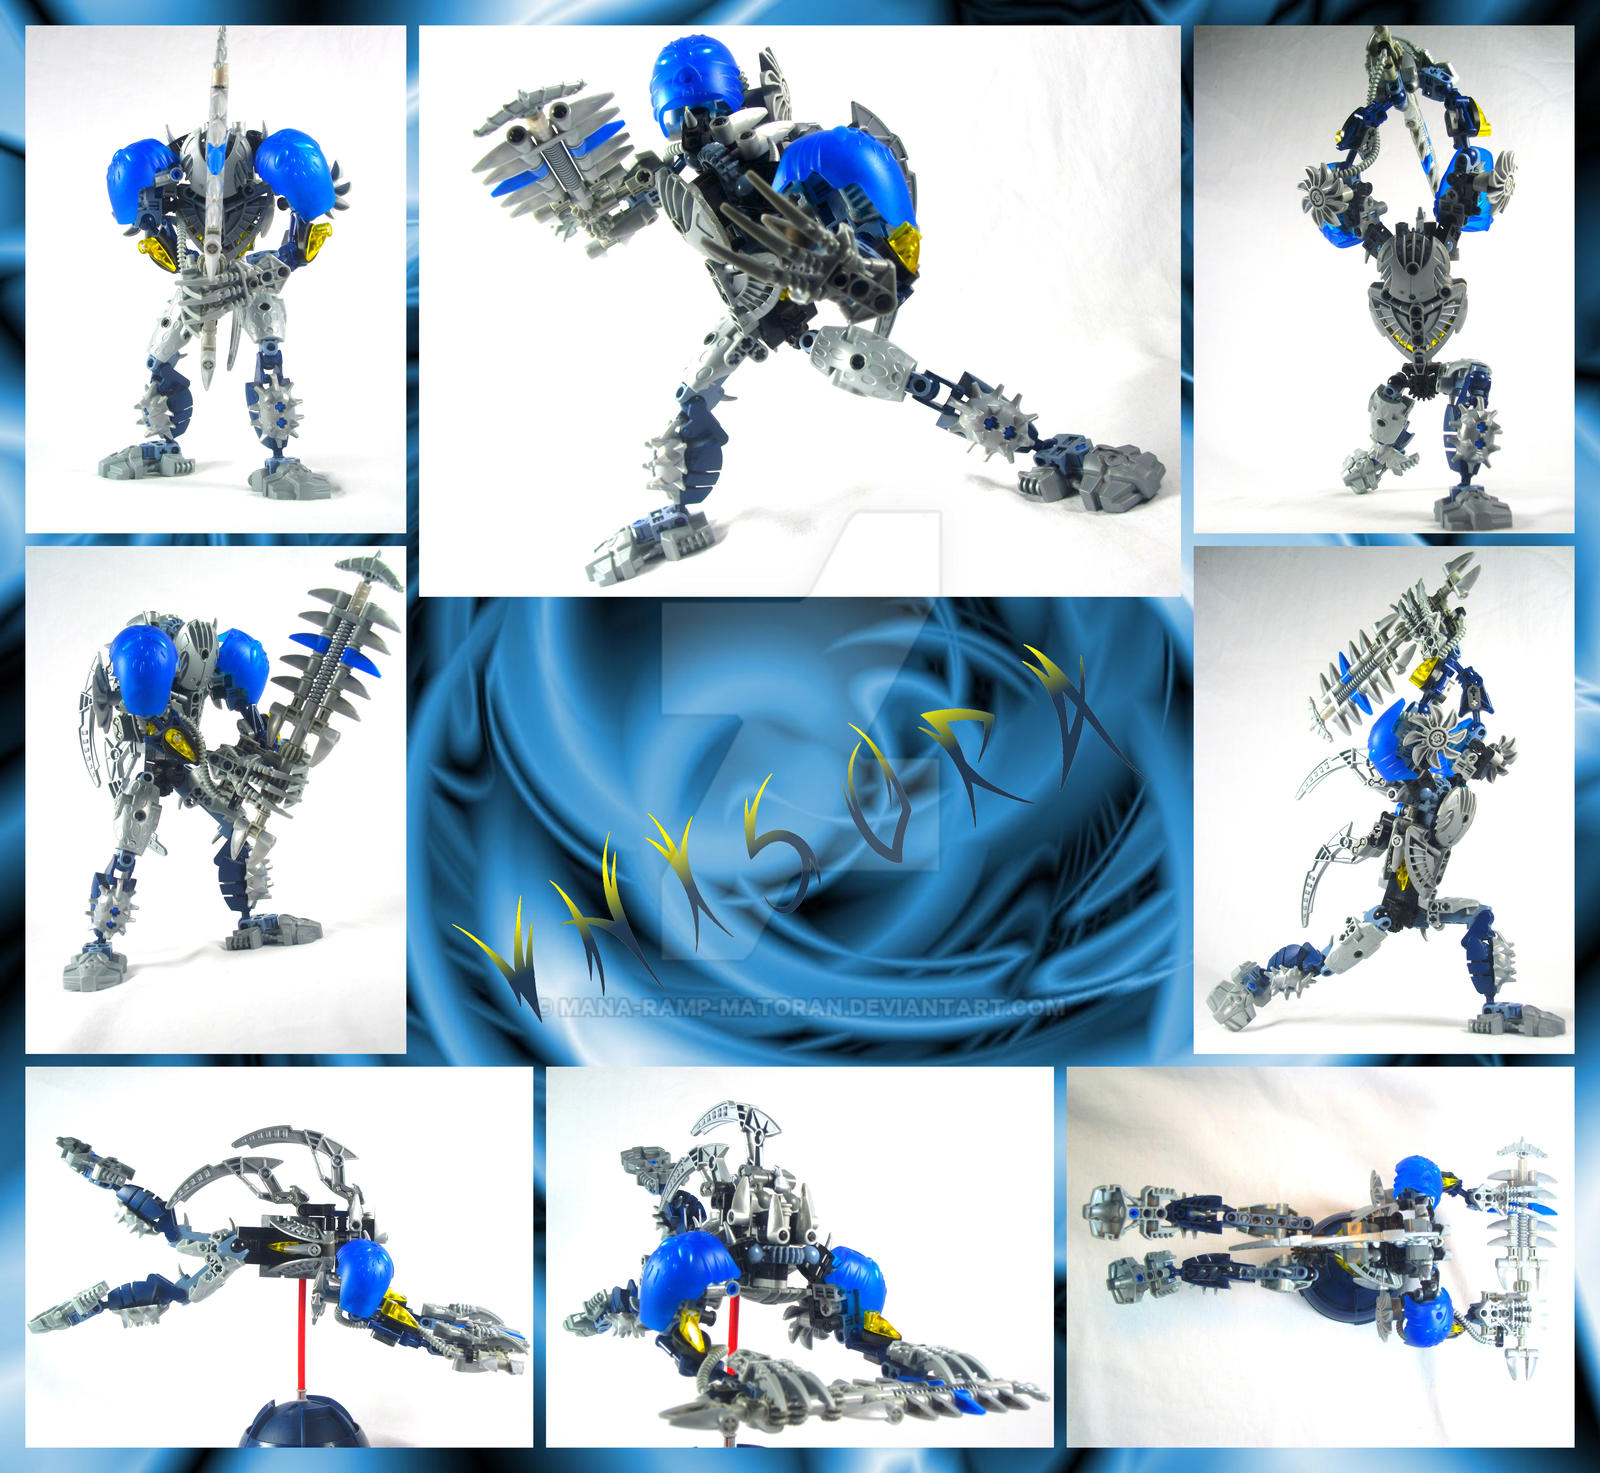 Bionicle MOC: Vhisora by 3rdeye88